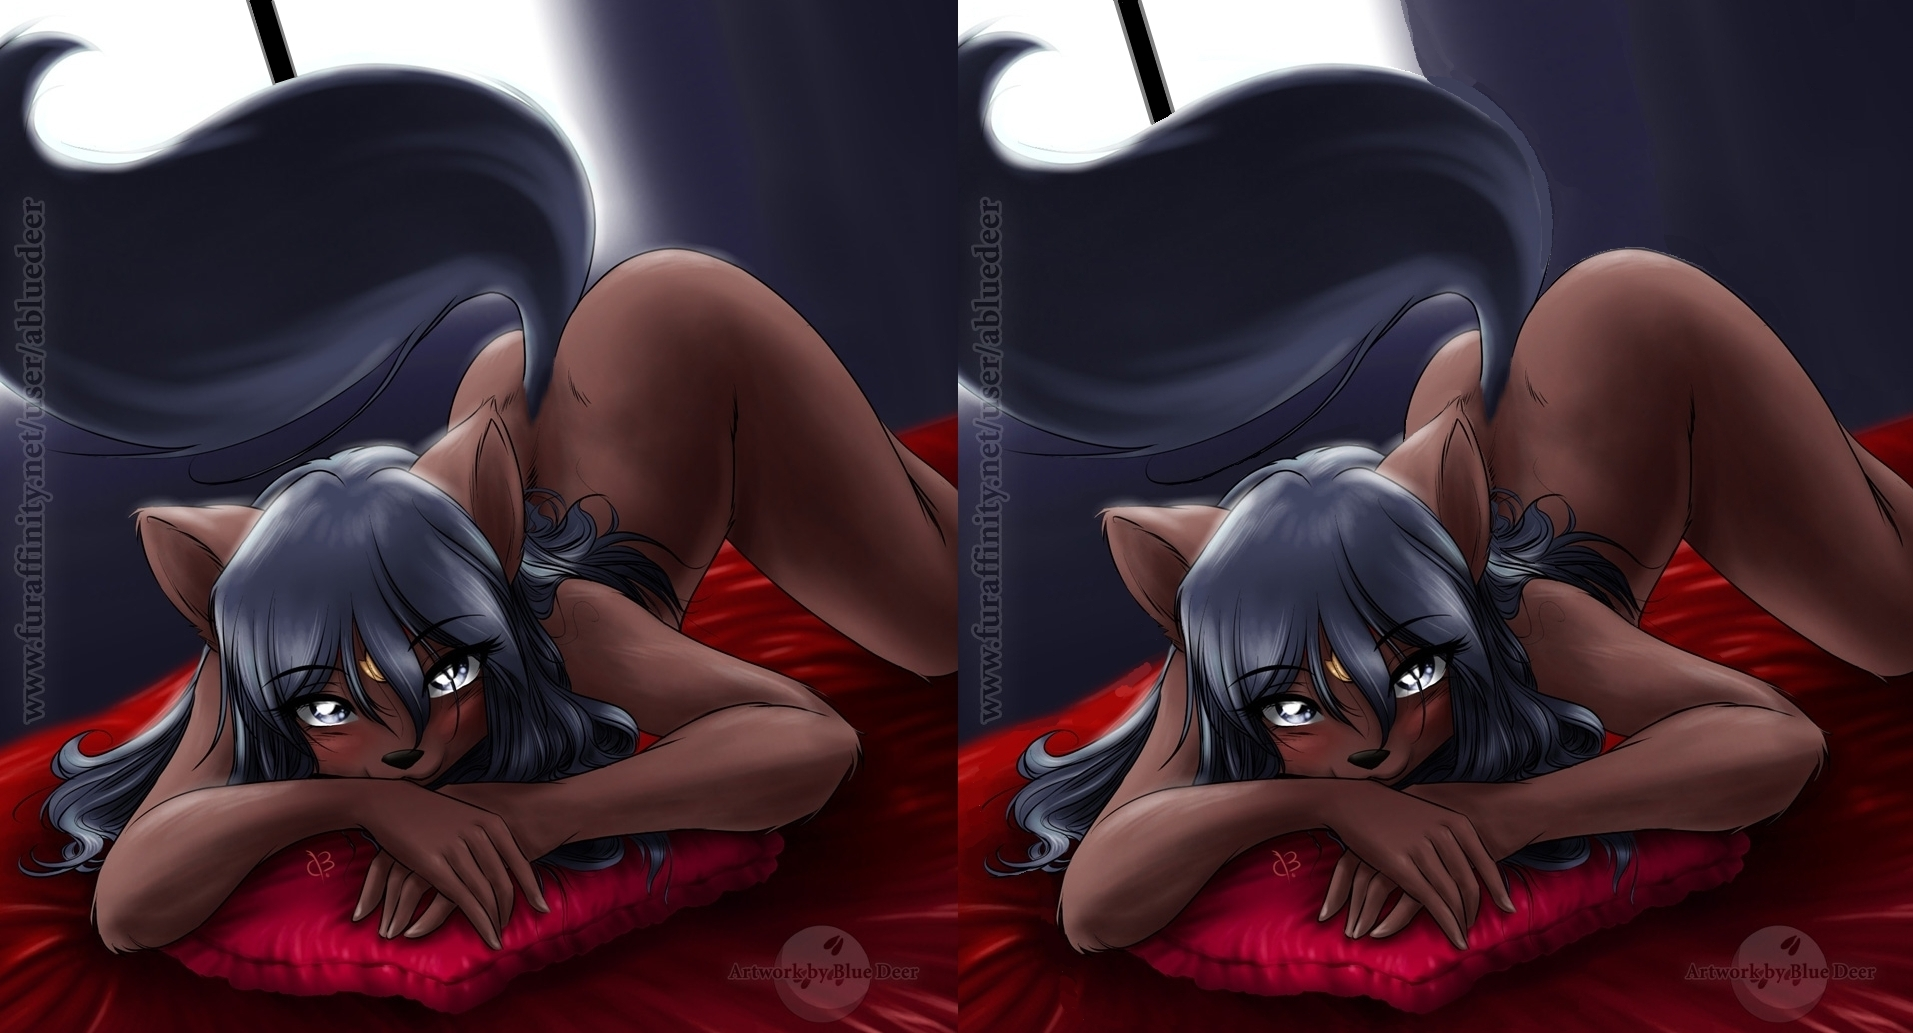 Anime porn yiff adult movie